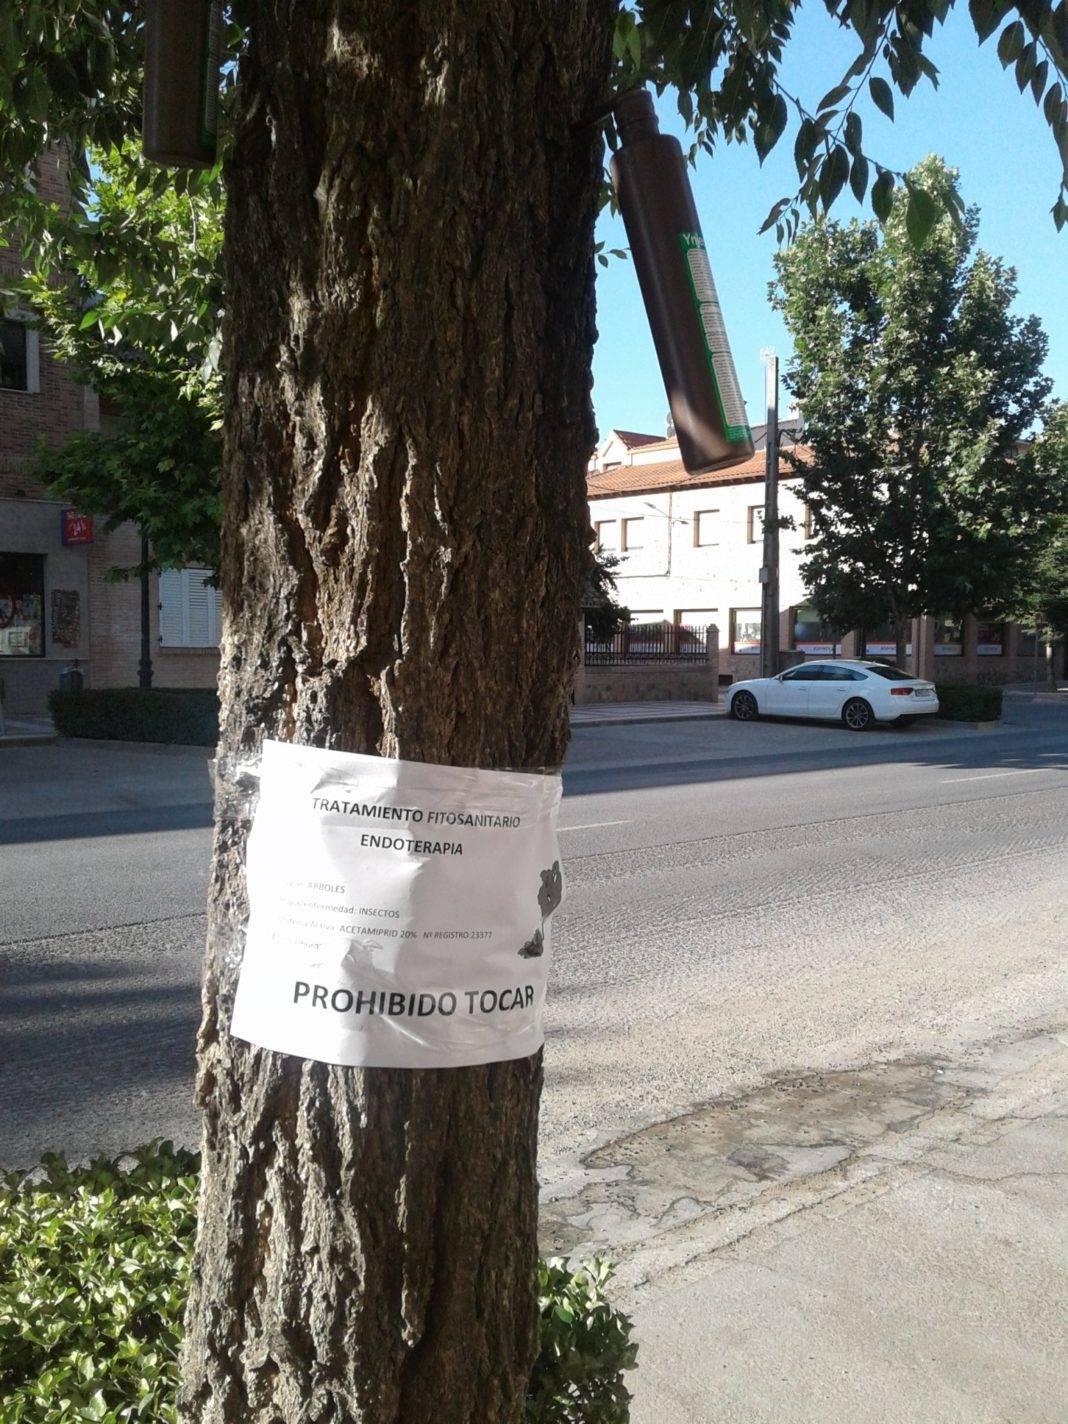 tratamiento arboles endoterapia herencia 1 1068x1424 - Tratamiento de árboles con endoterapia en Herencia